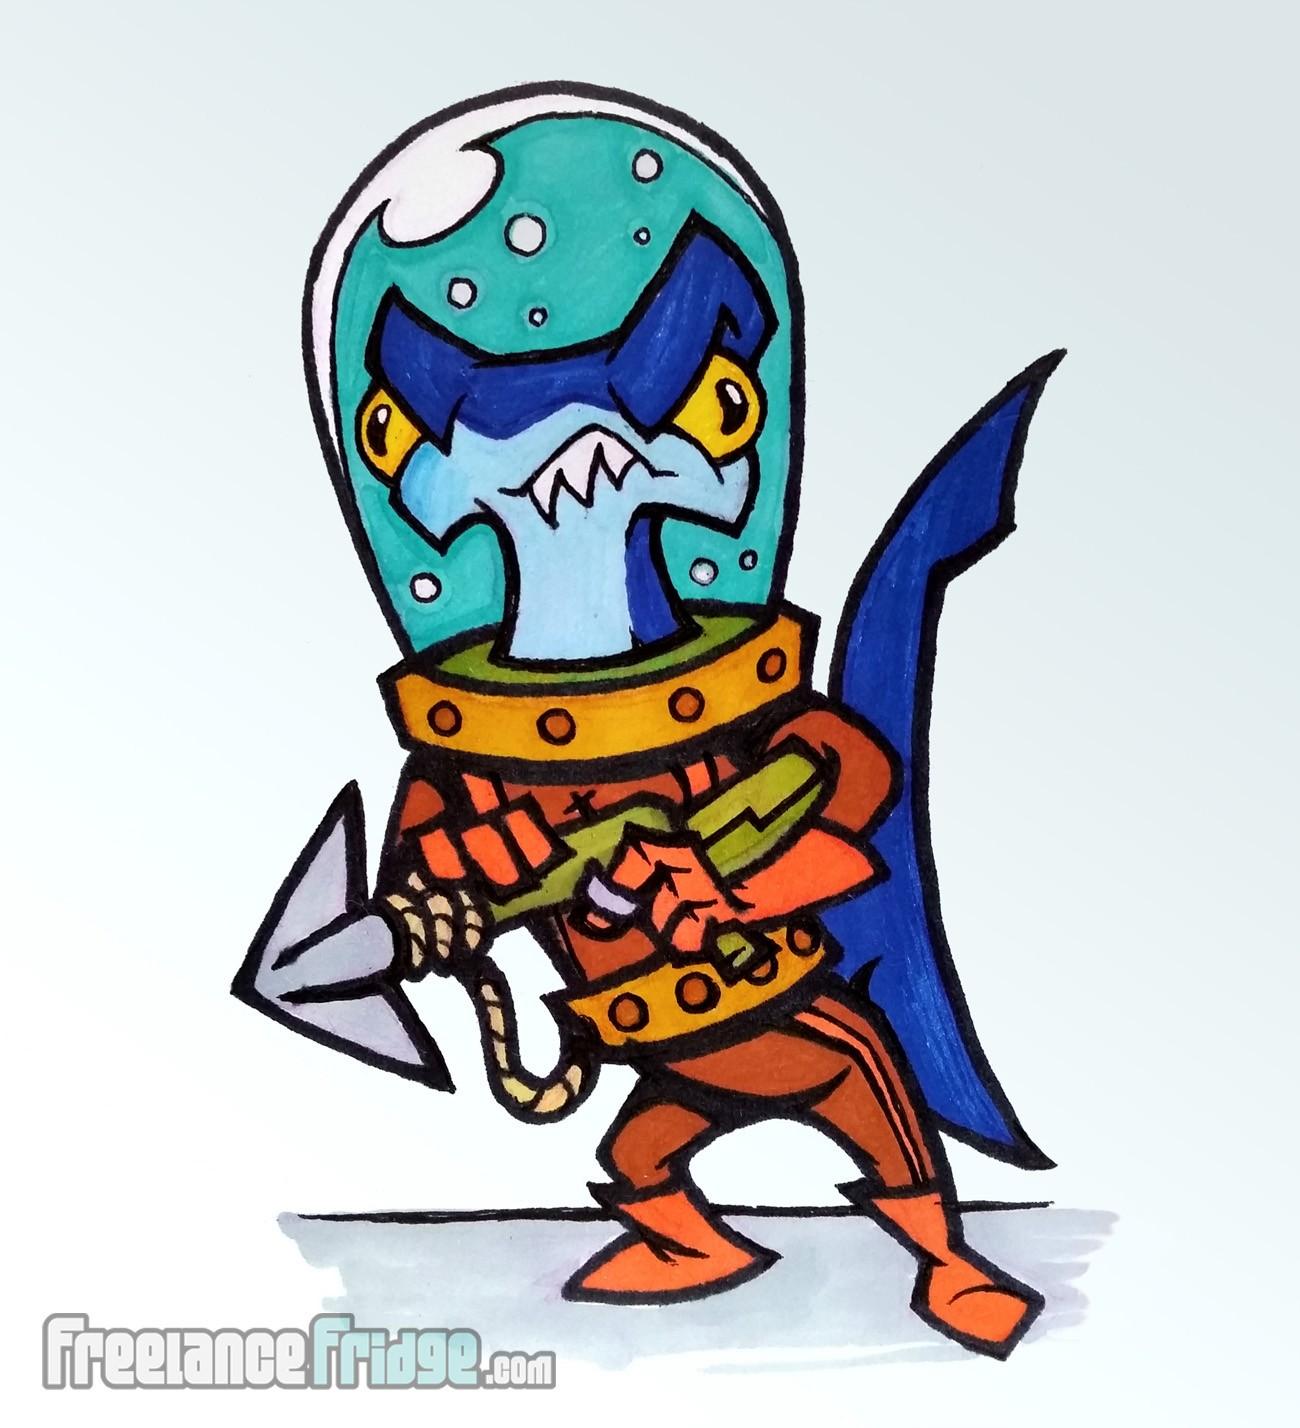 cartoon hammerhead shark wearing vintage diving suit with harpoon gun